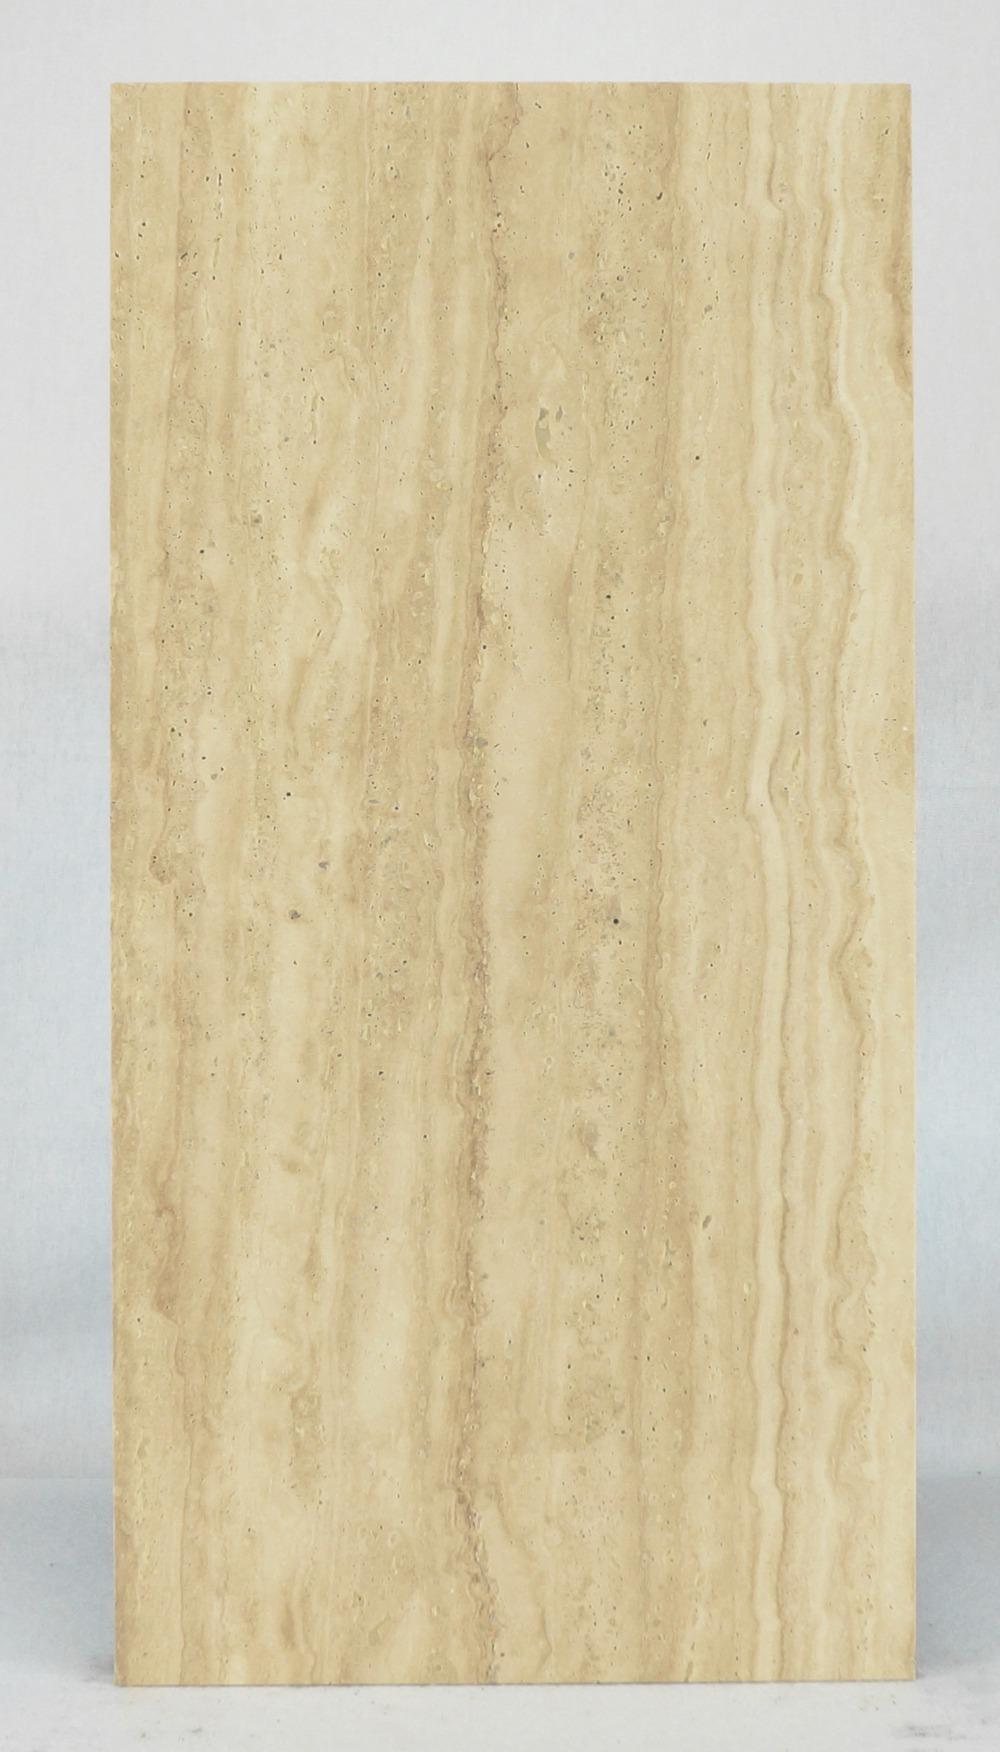 Moreroom stone light beige travertine panel.jpg